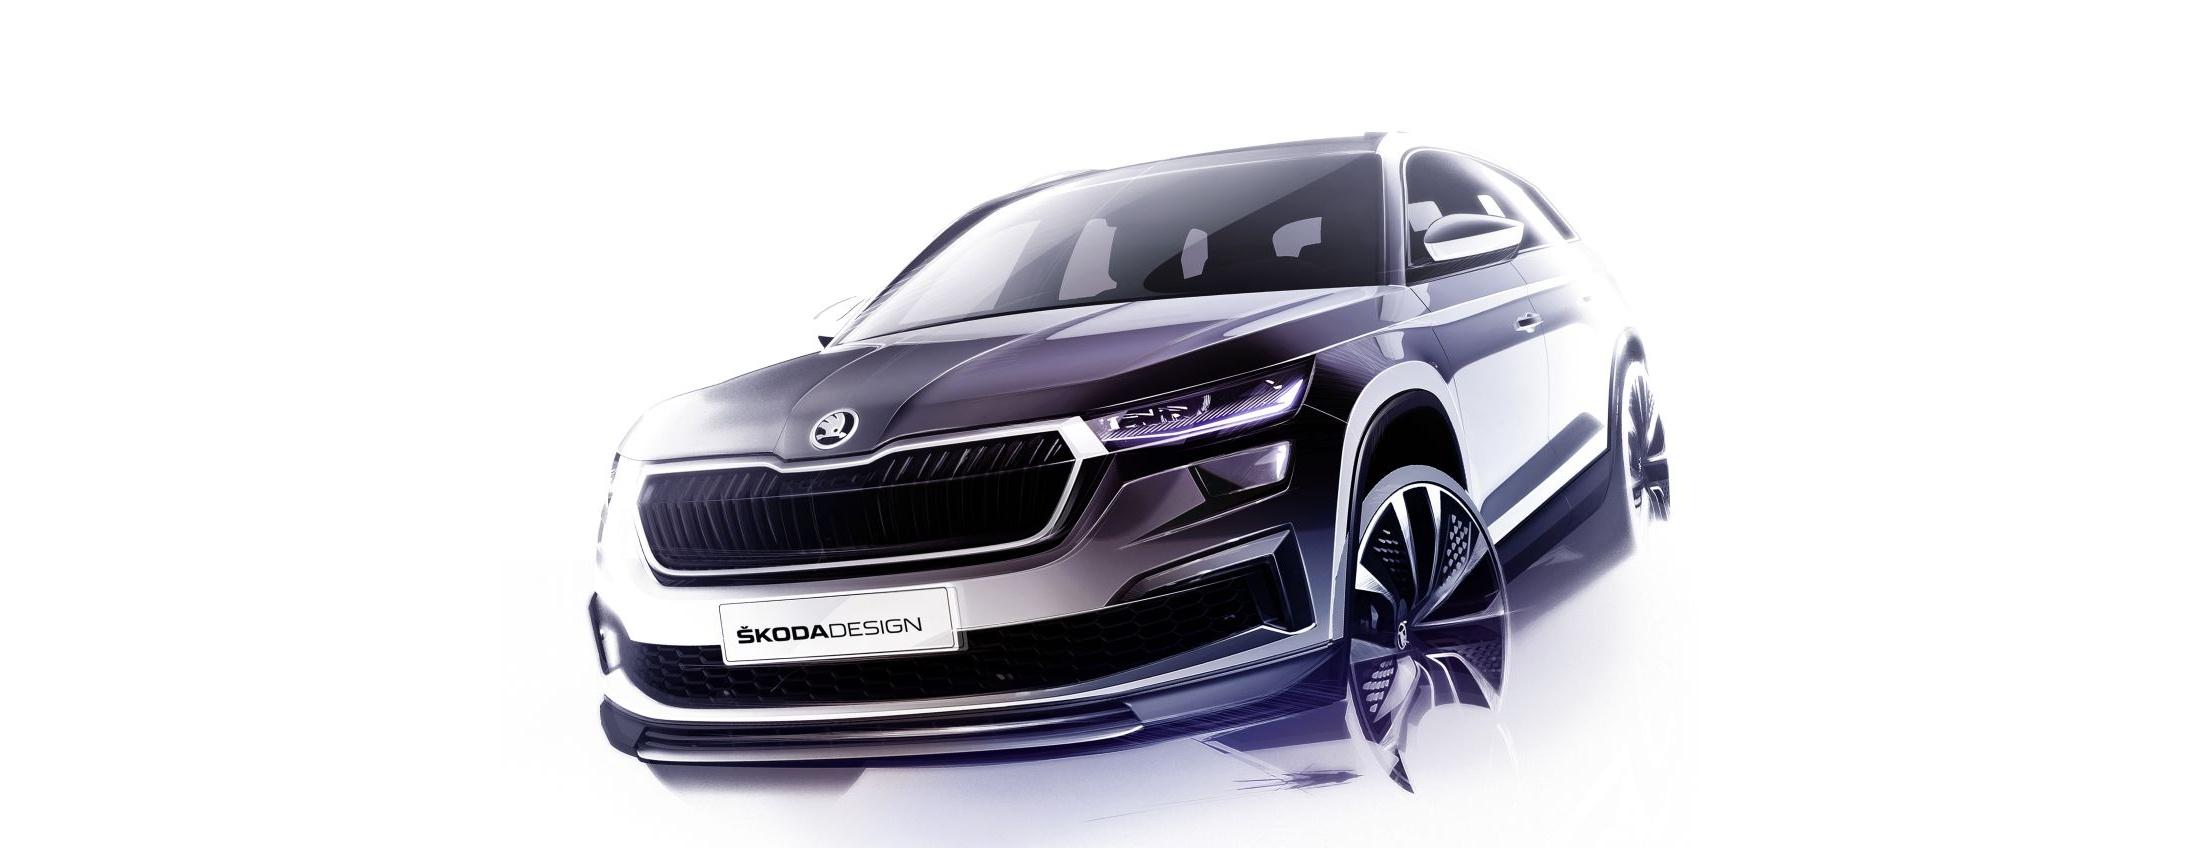 Skoda_Kodiaq-facelift-designova_skica-1